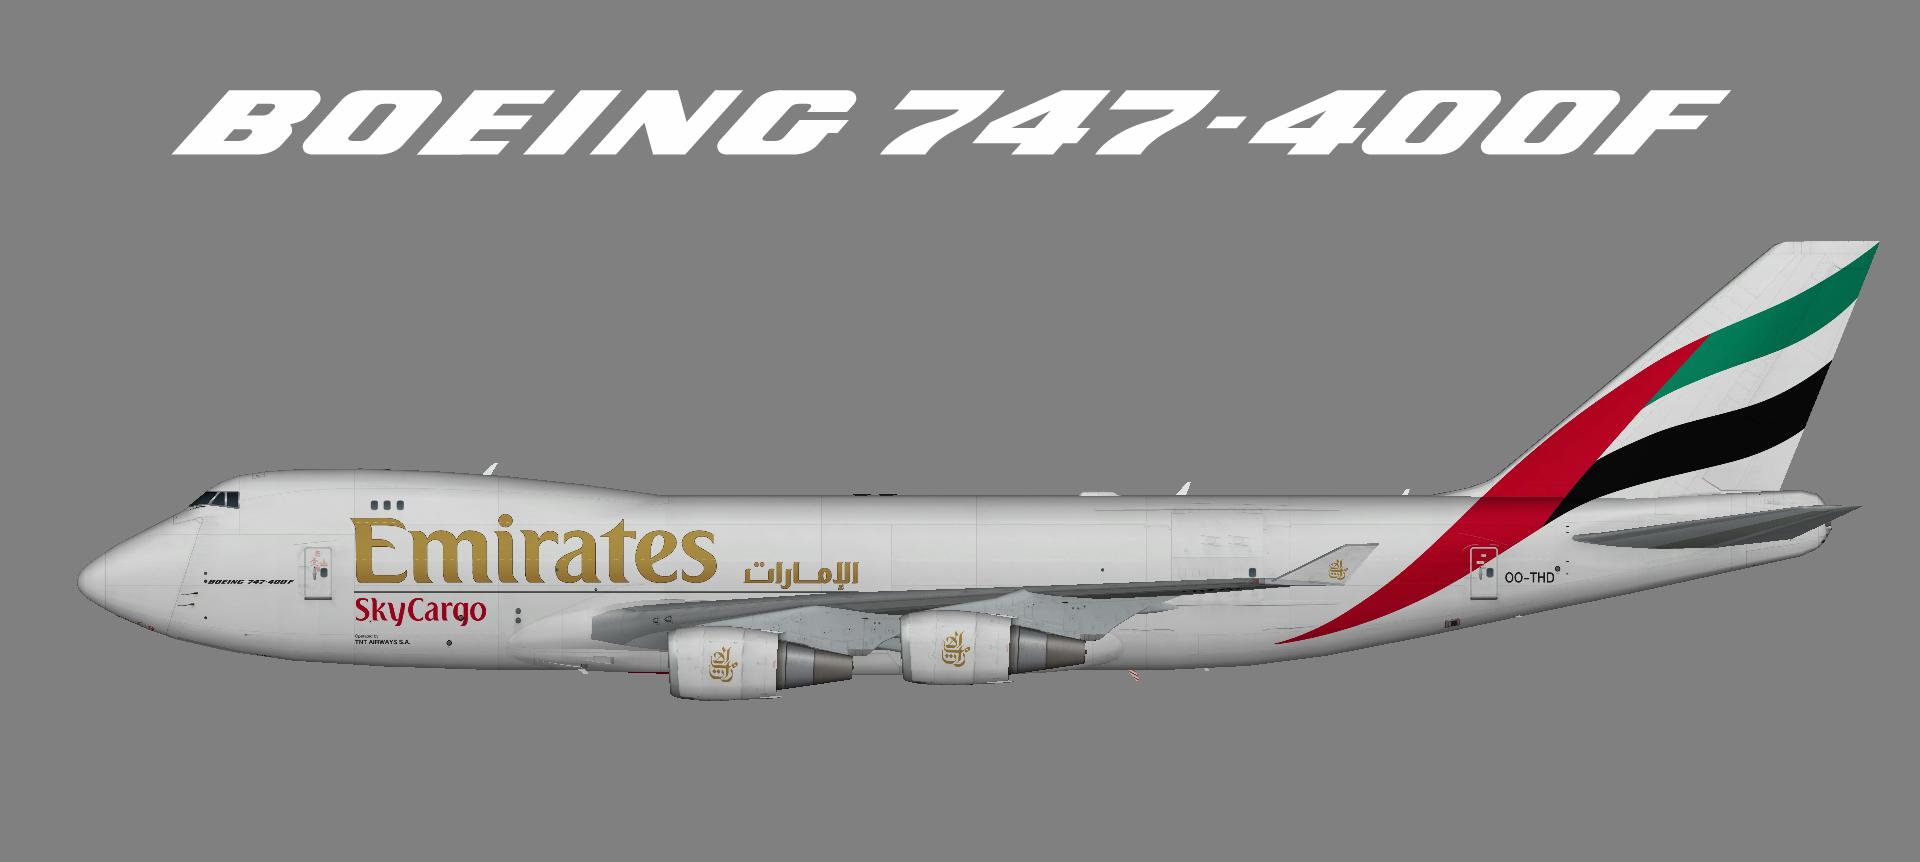 Emirates Skycargo 747-400F